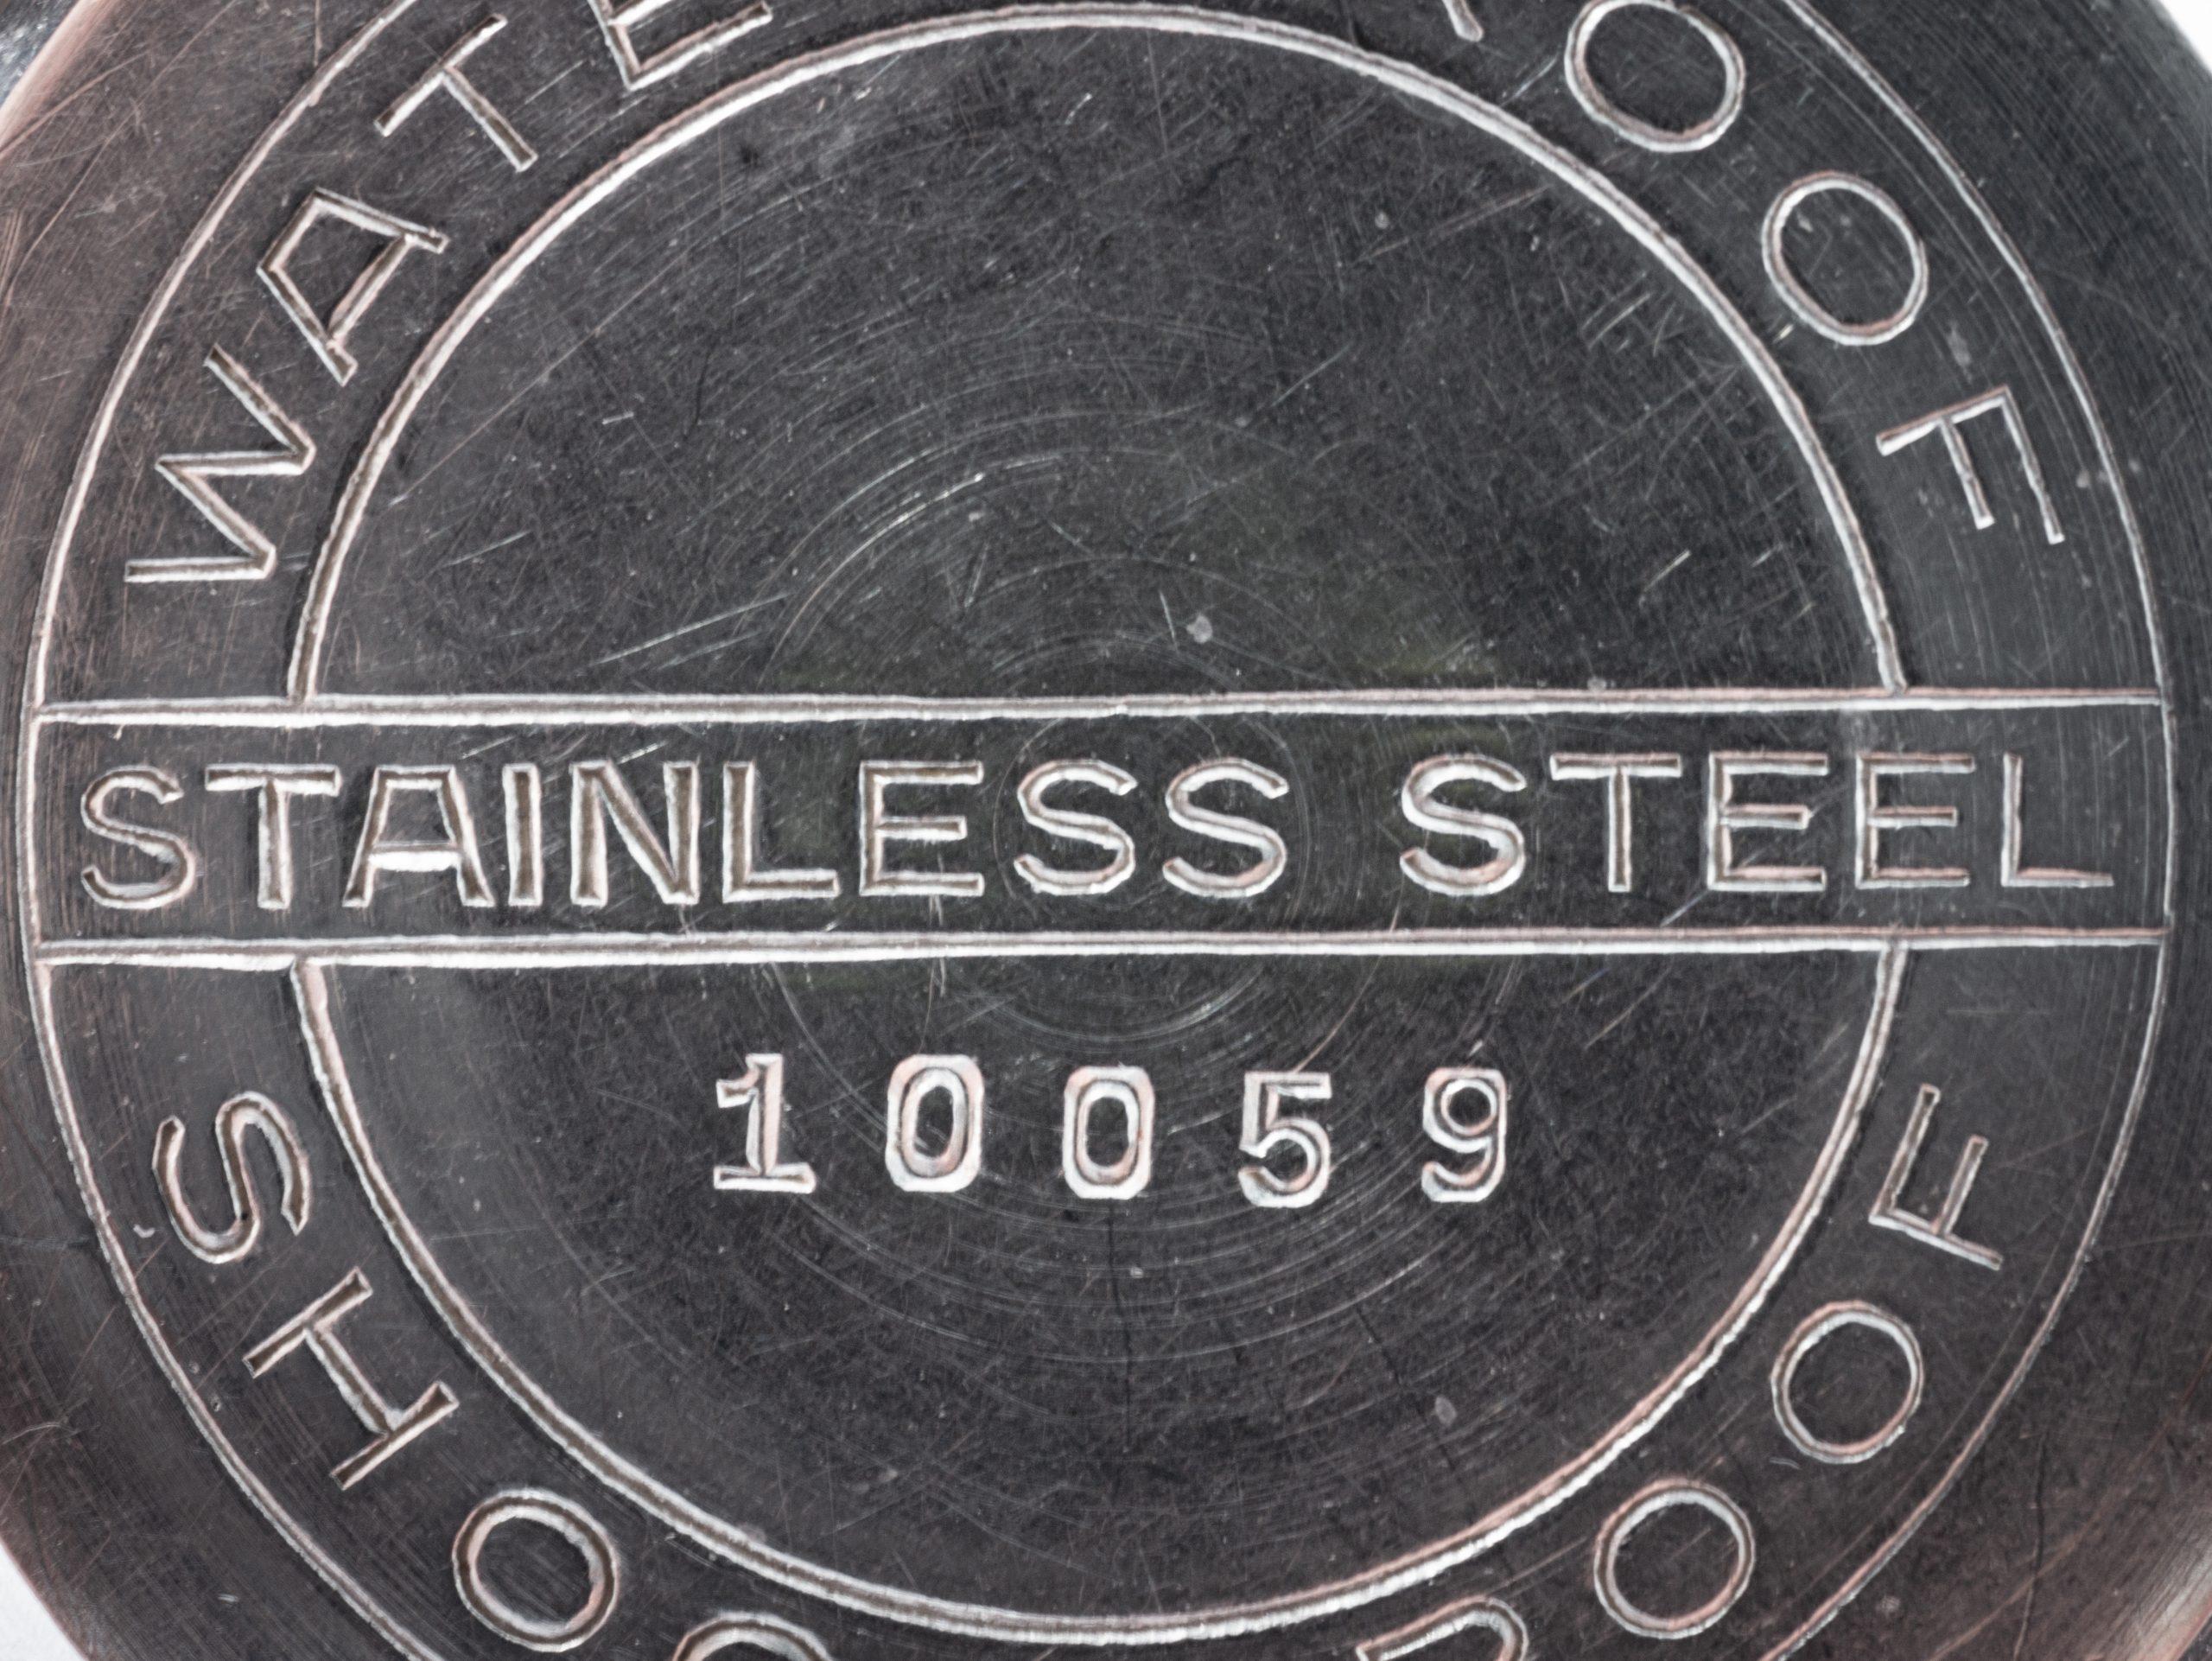 Vintage Silvana waterproof incabloc screw case steel old mechanical watch radium sector dial